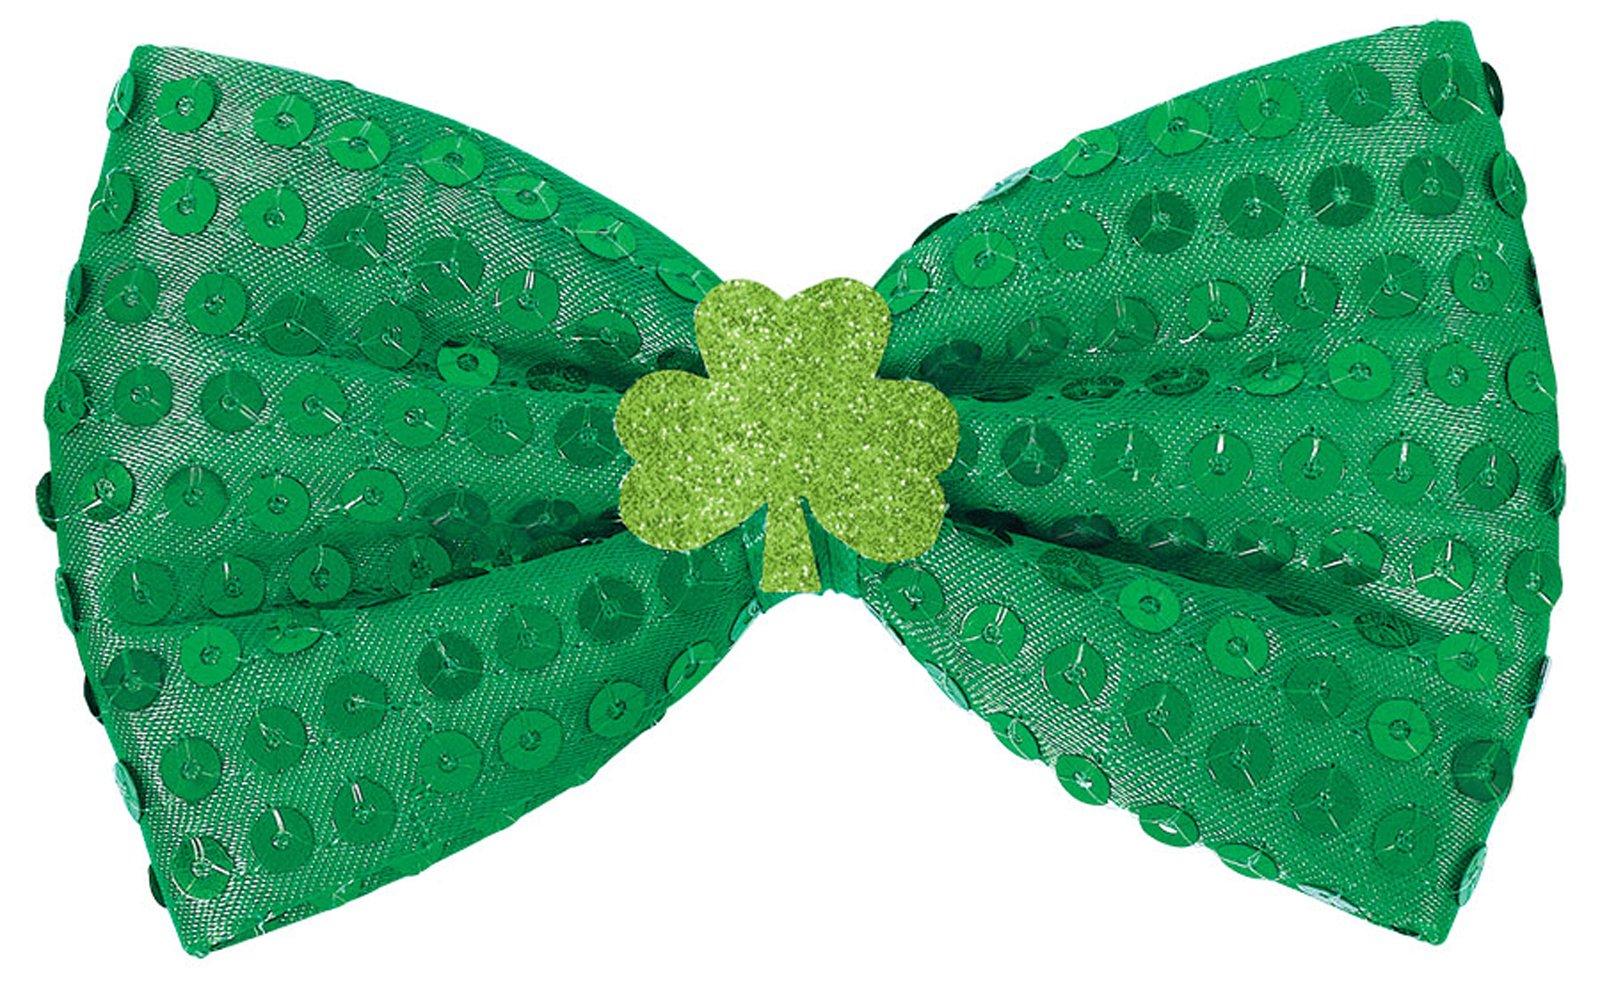 1600x994 St. Patrick's Day Adult Bowtie Choker